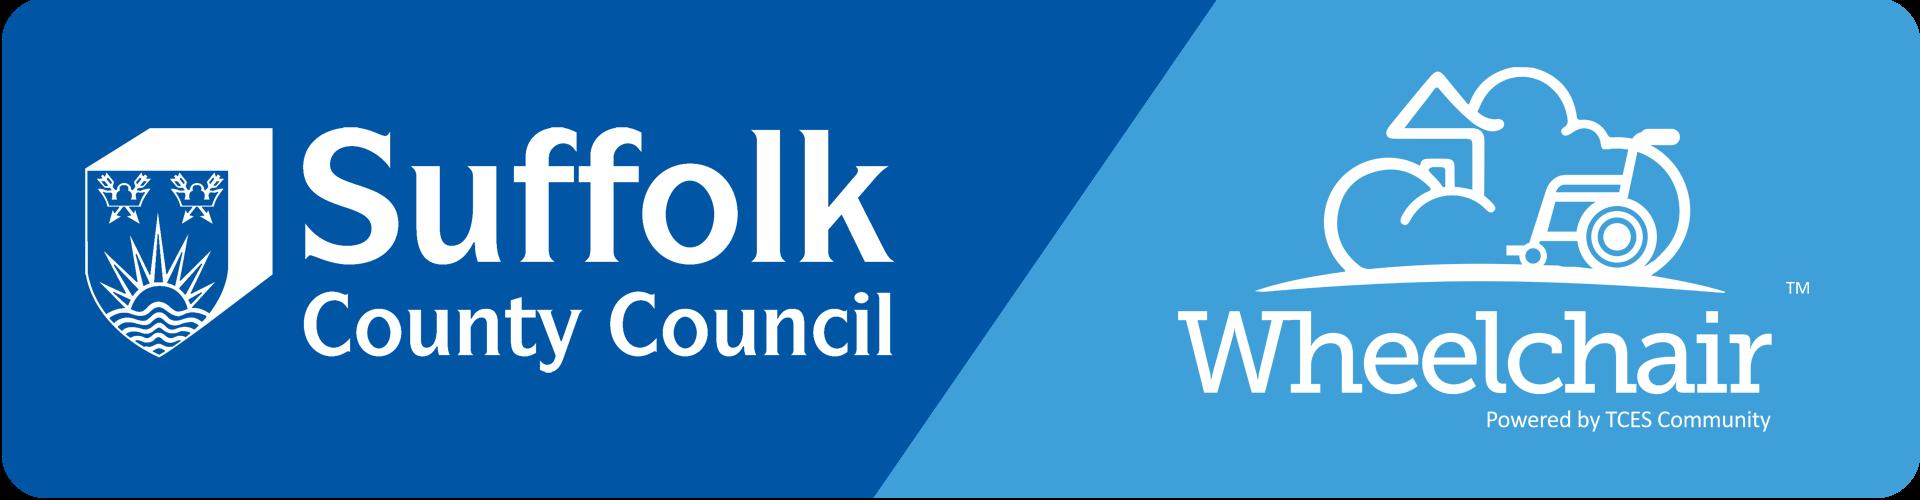 suffolk county council logo and TCES Wheelchair logo